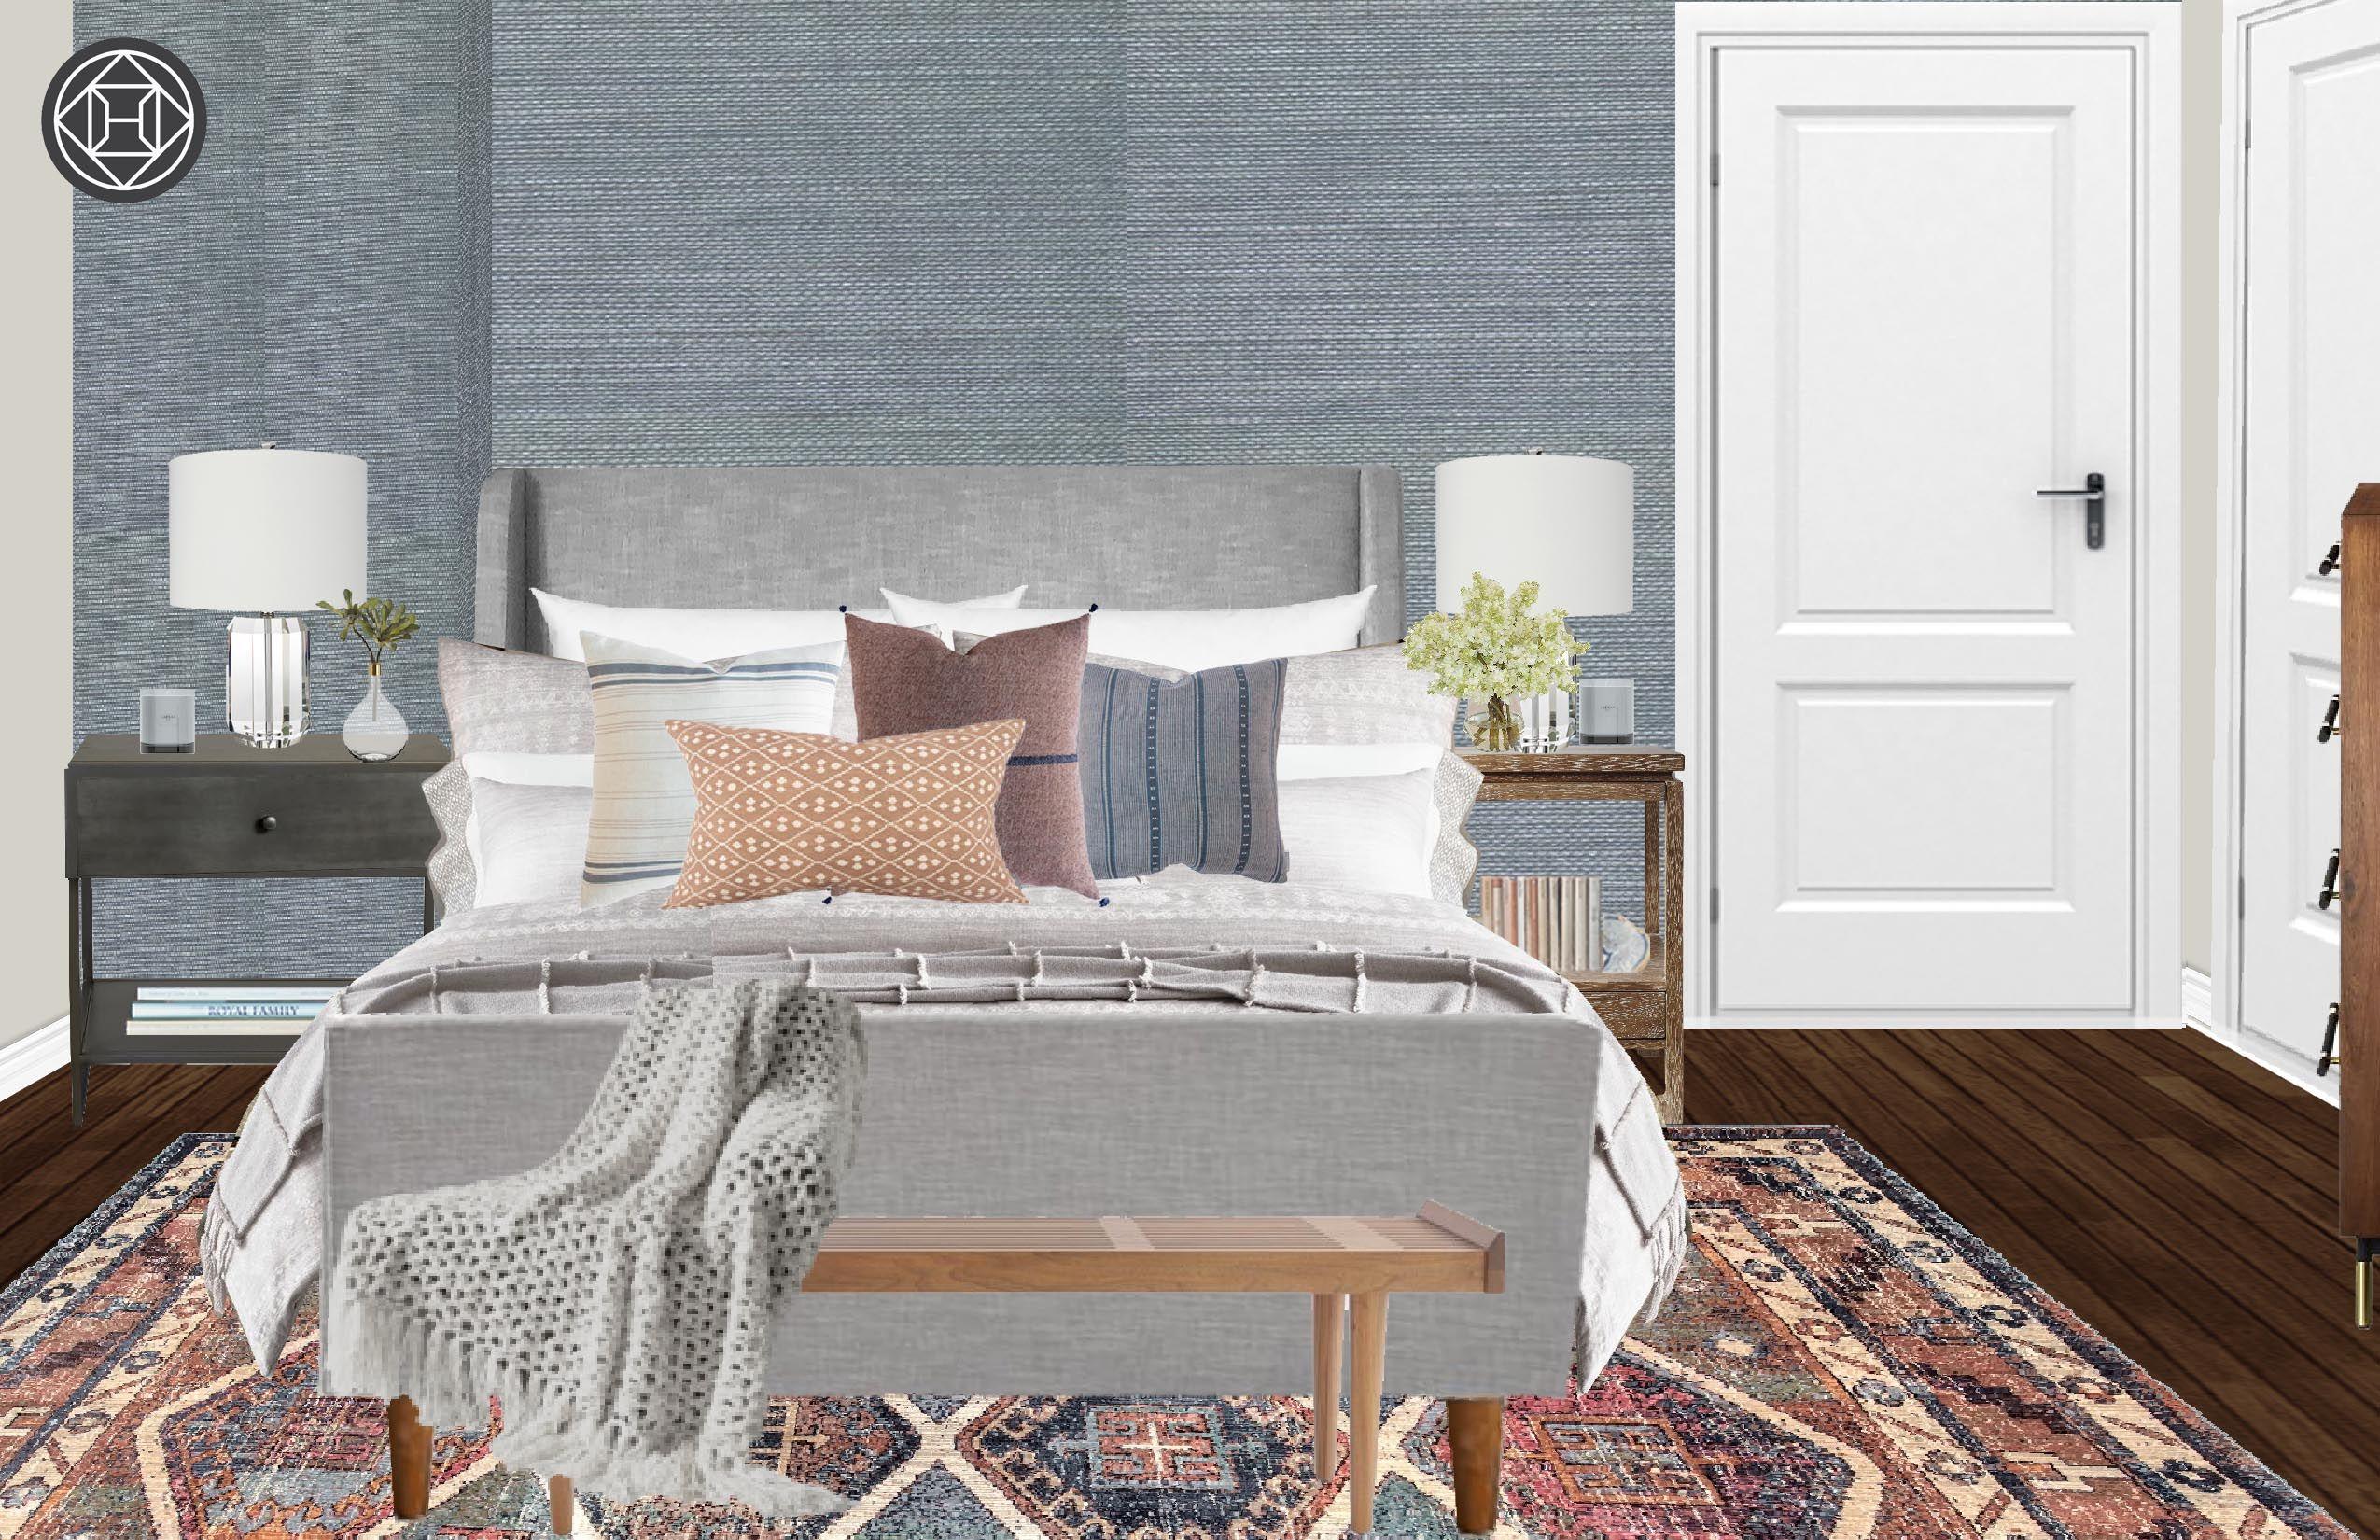 Bohemian Industrial Global Bedroom Design By Havenly Interior